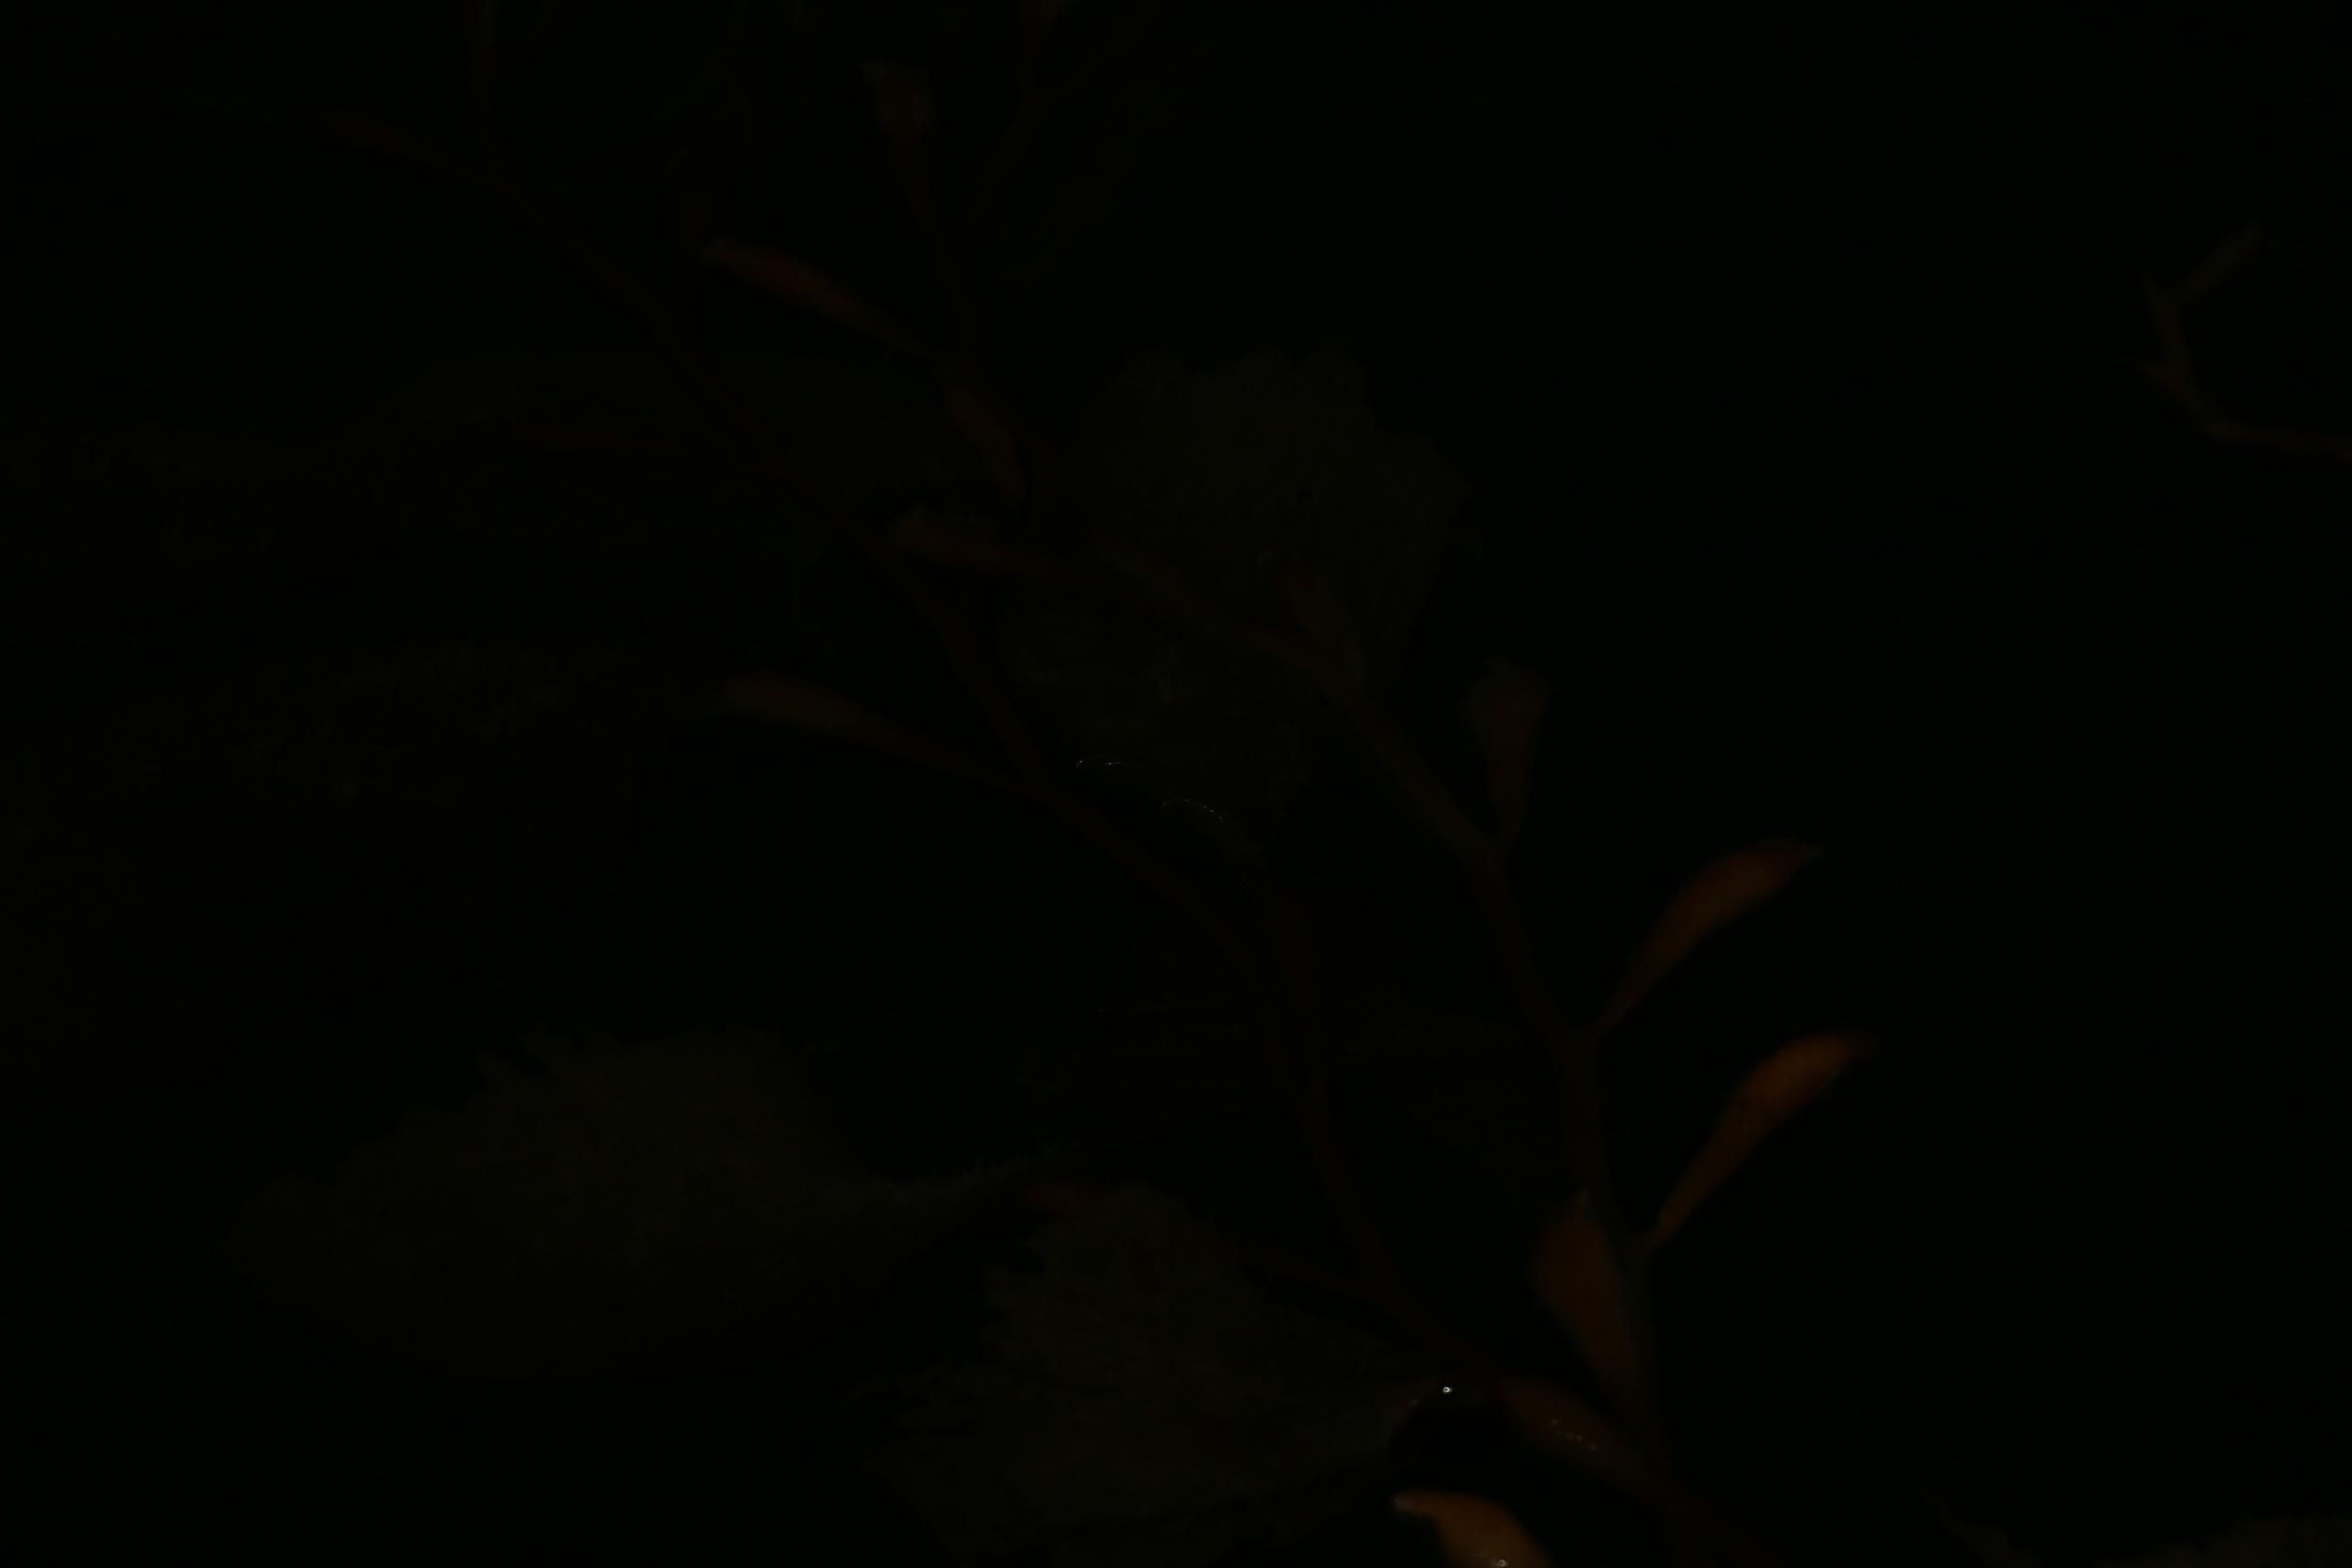 IMG_4794.JPG